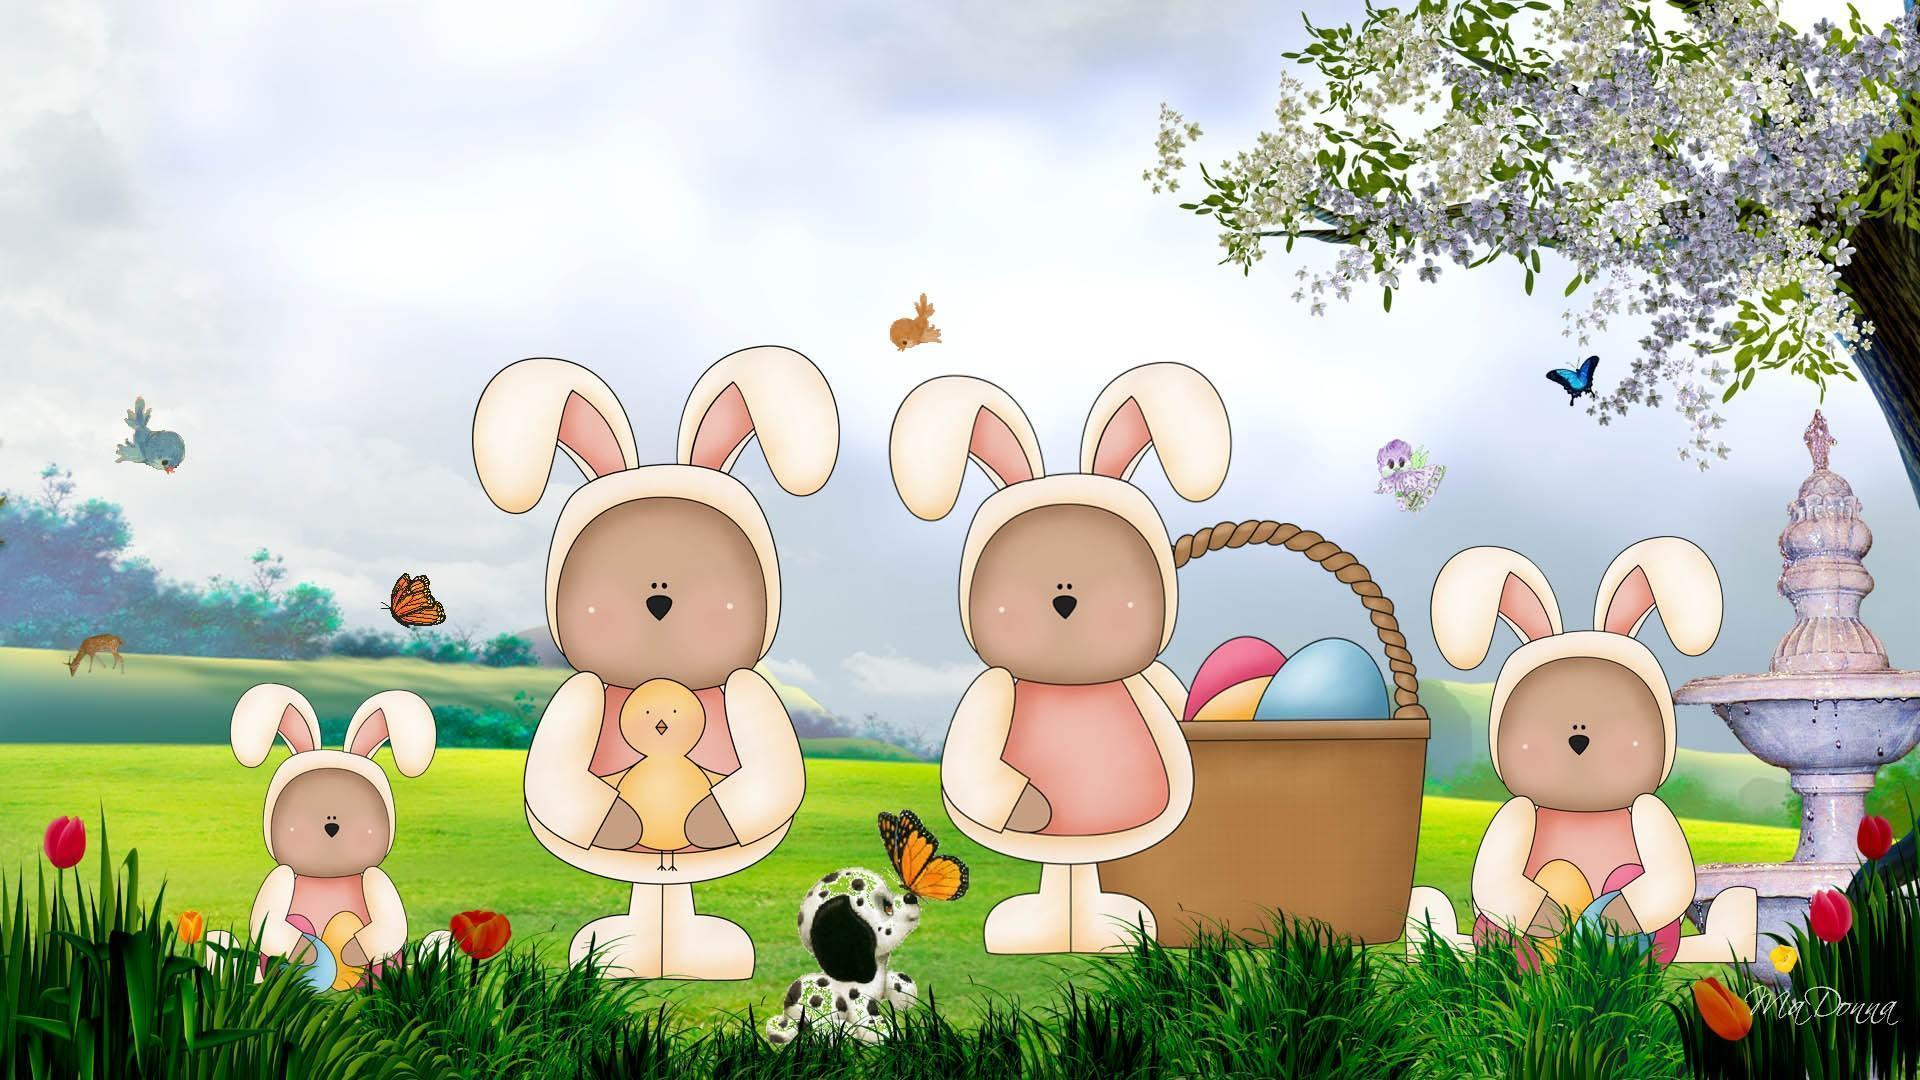 Easter bunny hd wallpapers wallpapersafari - Easter bunny wallpaper ...